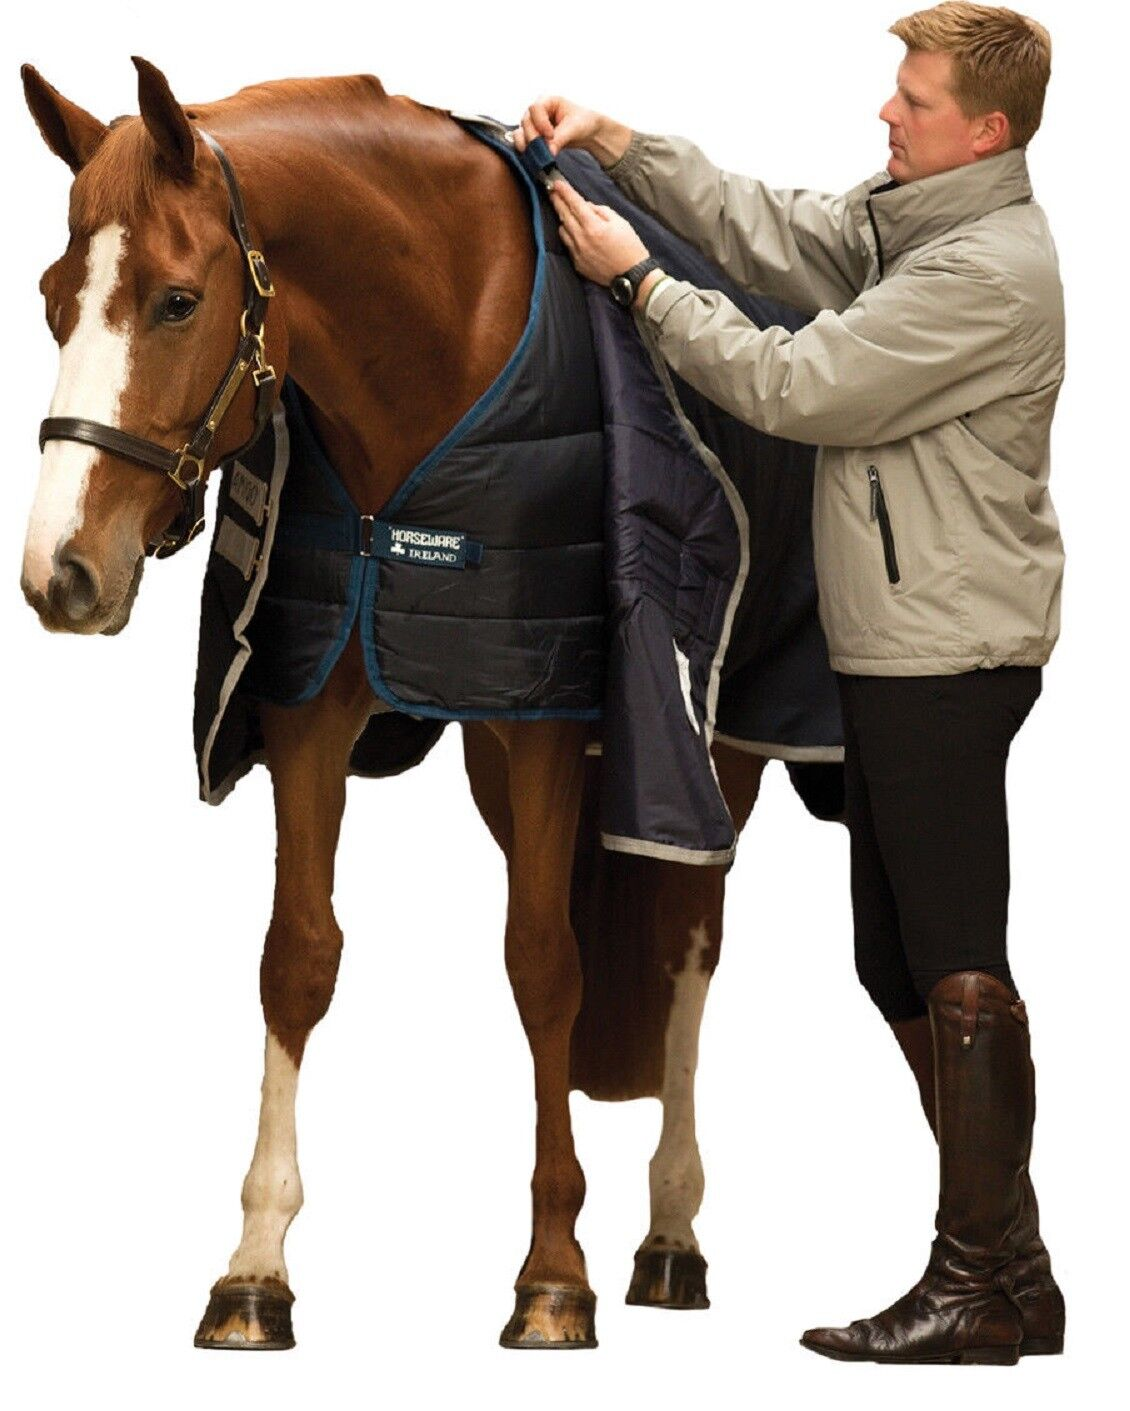 SALE Horseware Liner Fits Rambo Amigo Rhino Duo Horse Turnout Rug 200g 6ft 6